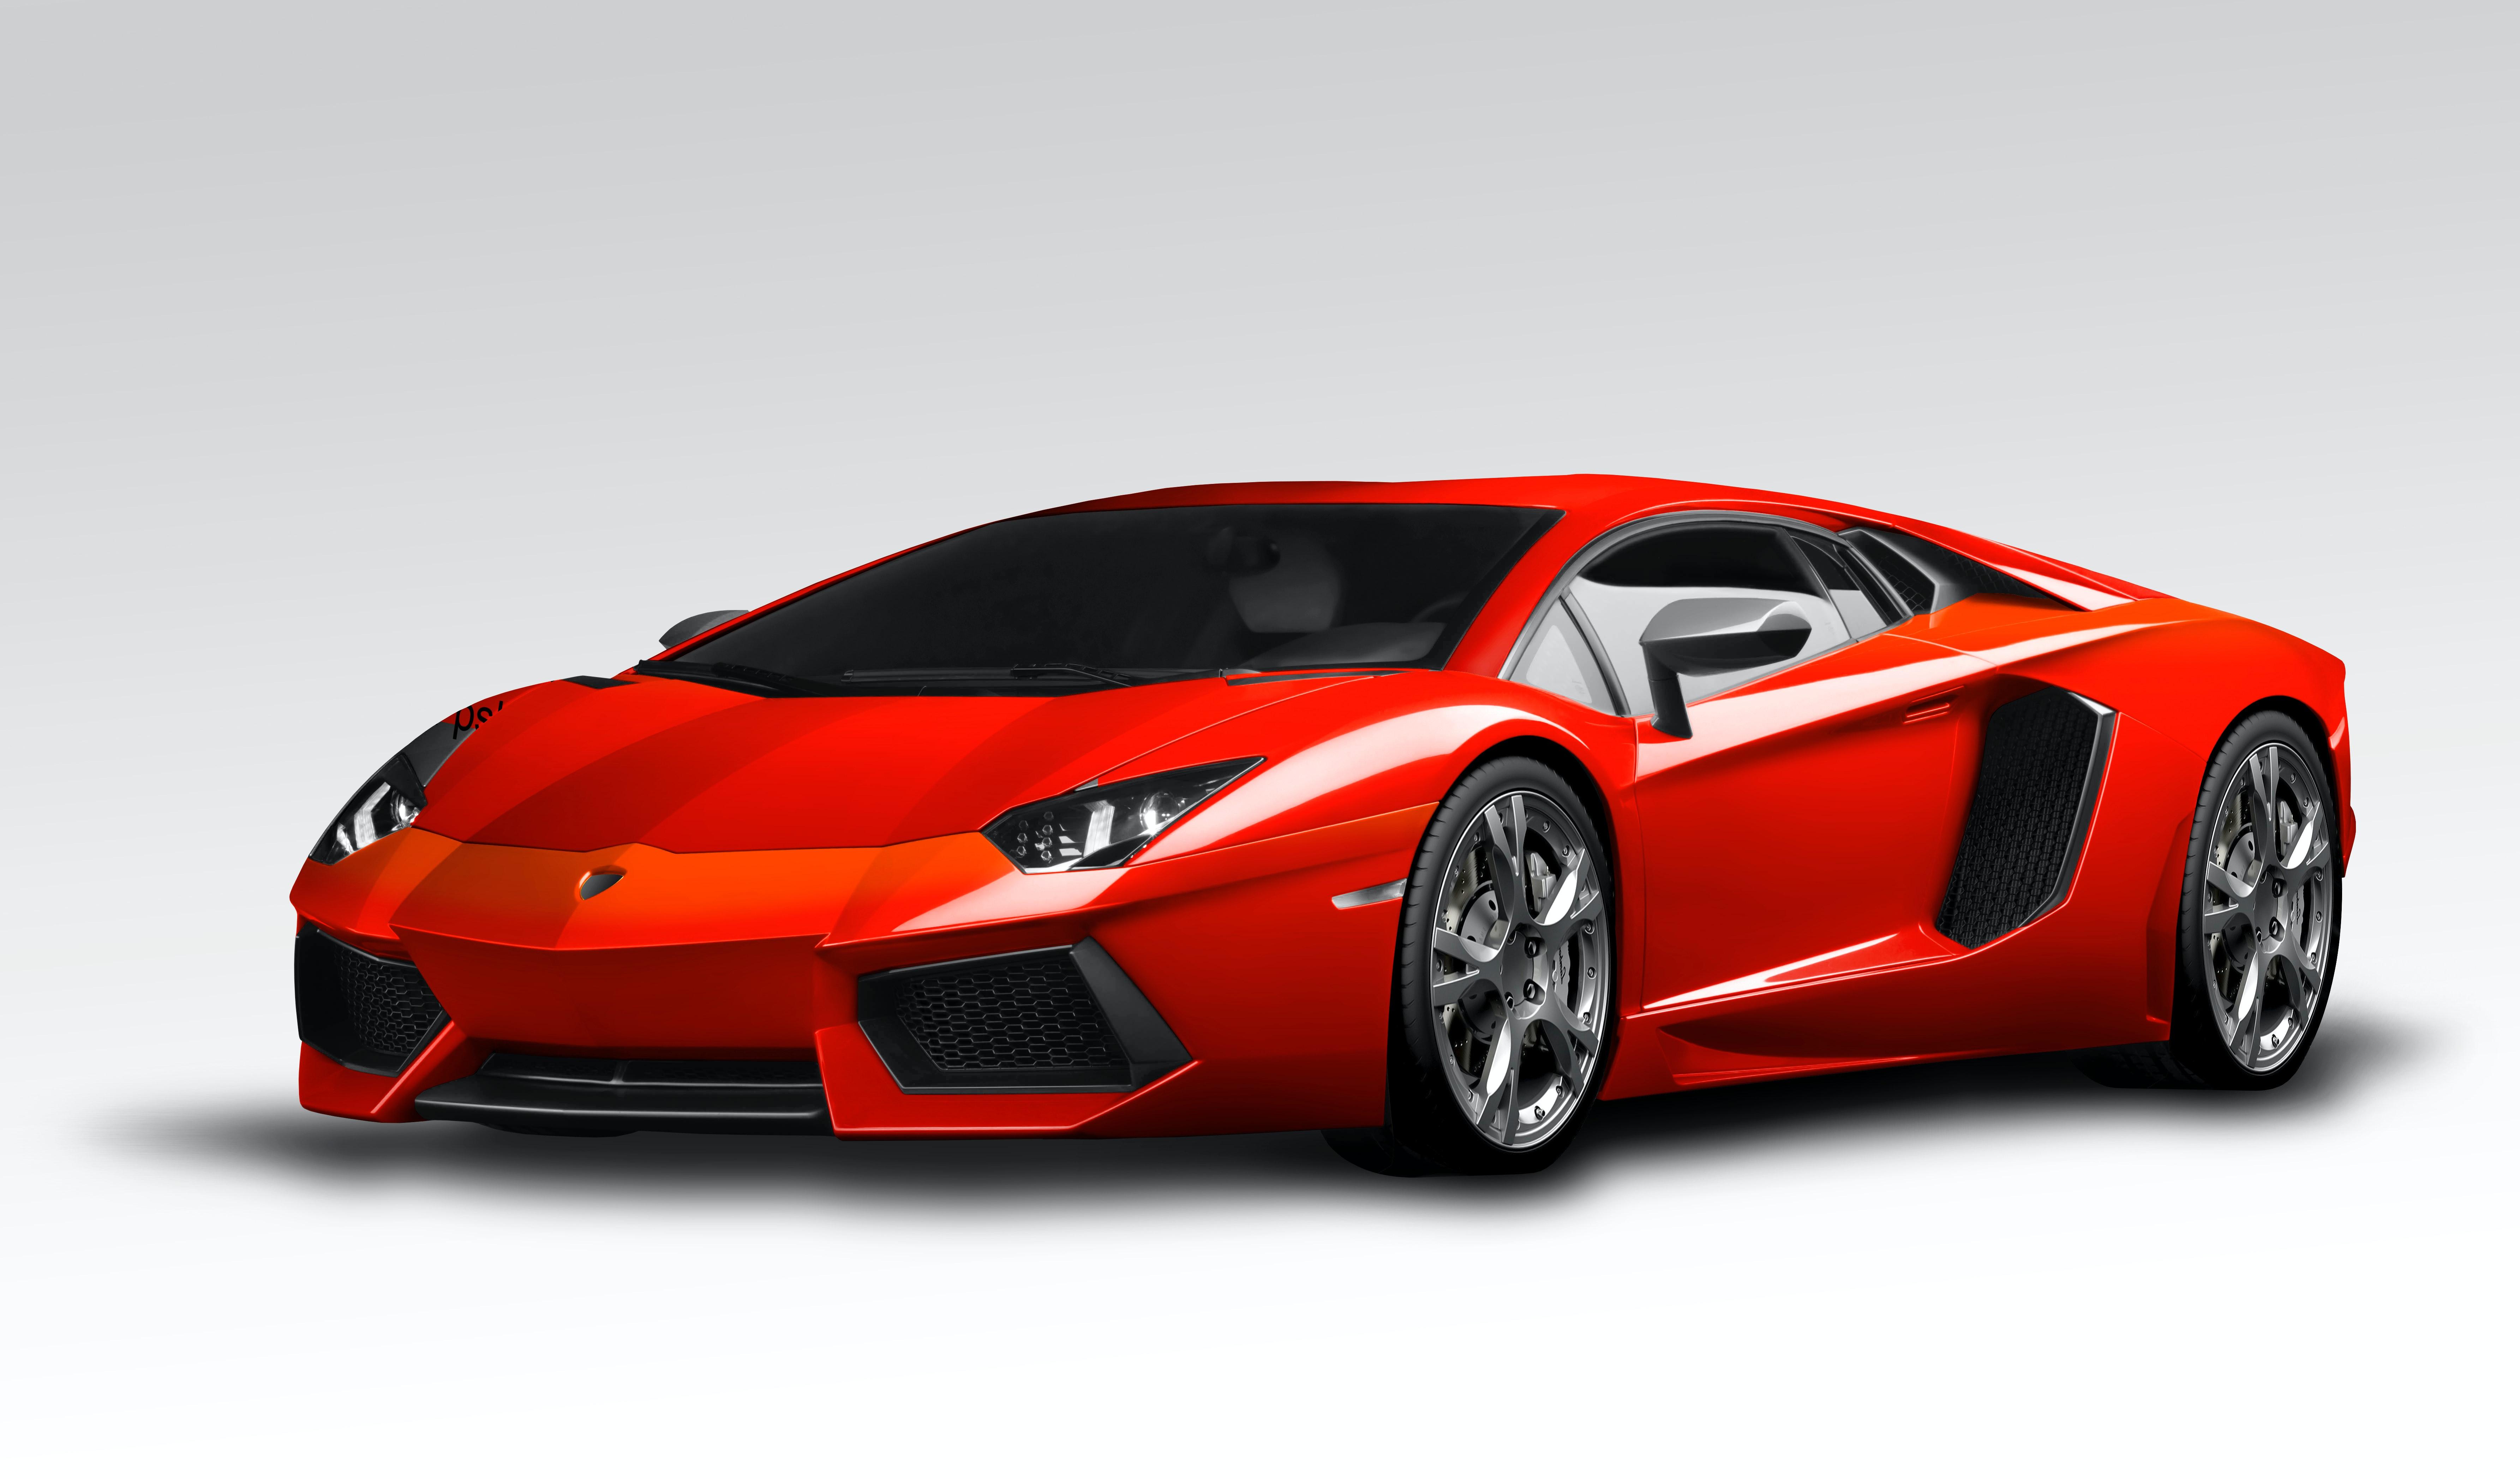 Descargar 1024x1024 Coches Vehículos Automóviles: Free Stock Photo Of Automóveis, Automóvel, Carro